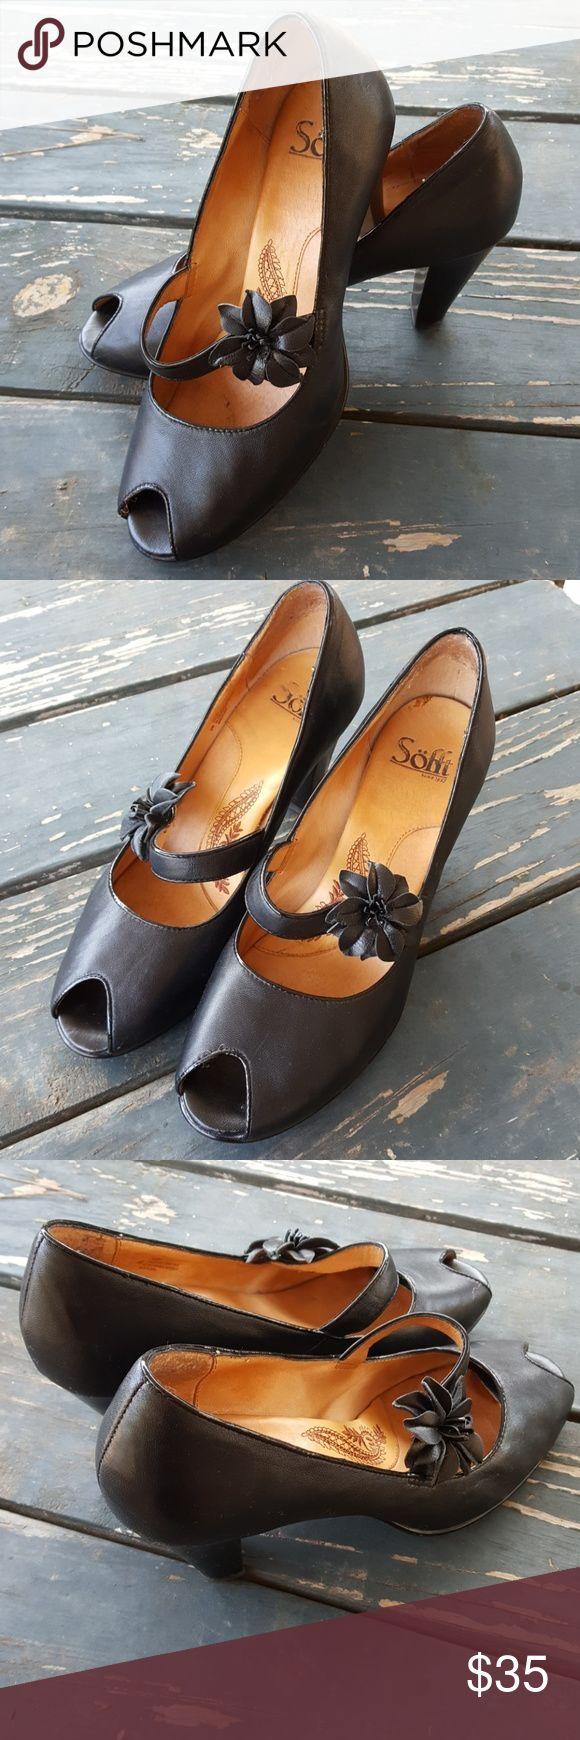 Sofft Black Leather Open Toe Heels w/Flower Strap Sofft Black Leather Open Toe Heels w/Flower Strap Sofft Shoes Heels